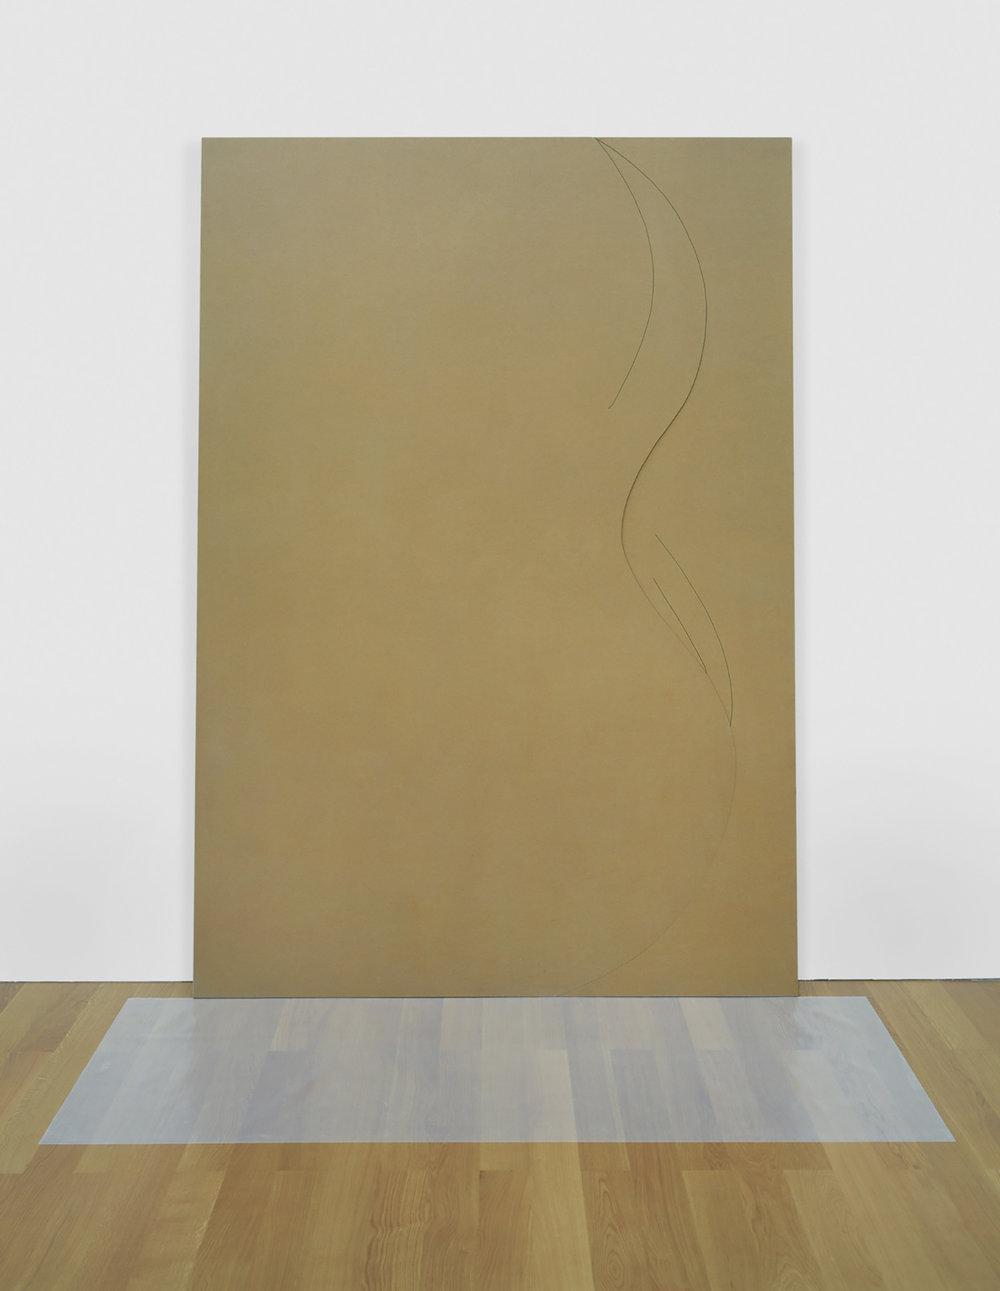 Buon governo | 1986 | Objekt, Spanplatte, Plastikfolie |275 x 185 cm